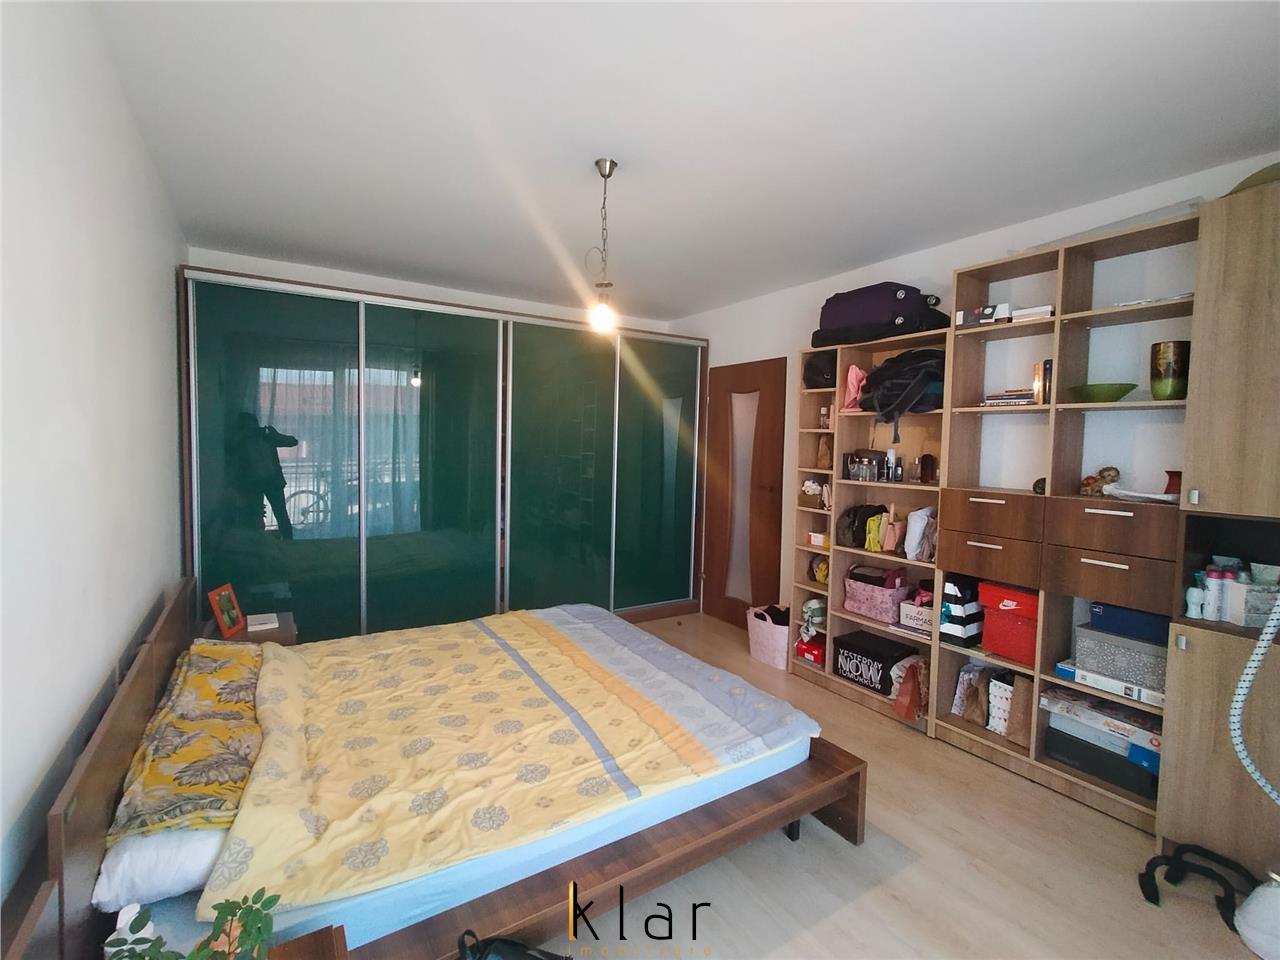 Apartament 2 camere, mobilat si utilat, parcare, zona Eroilor